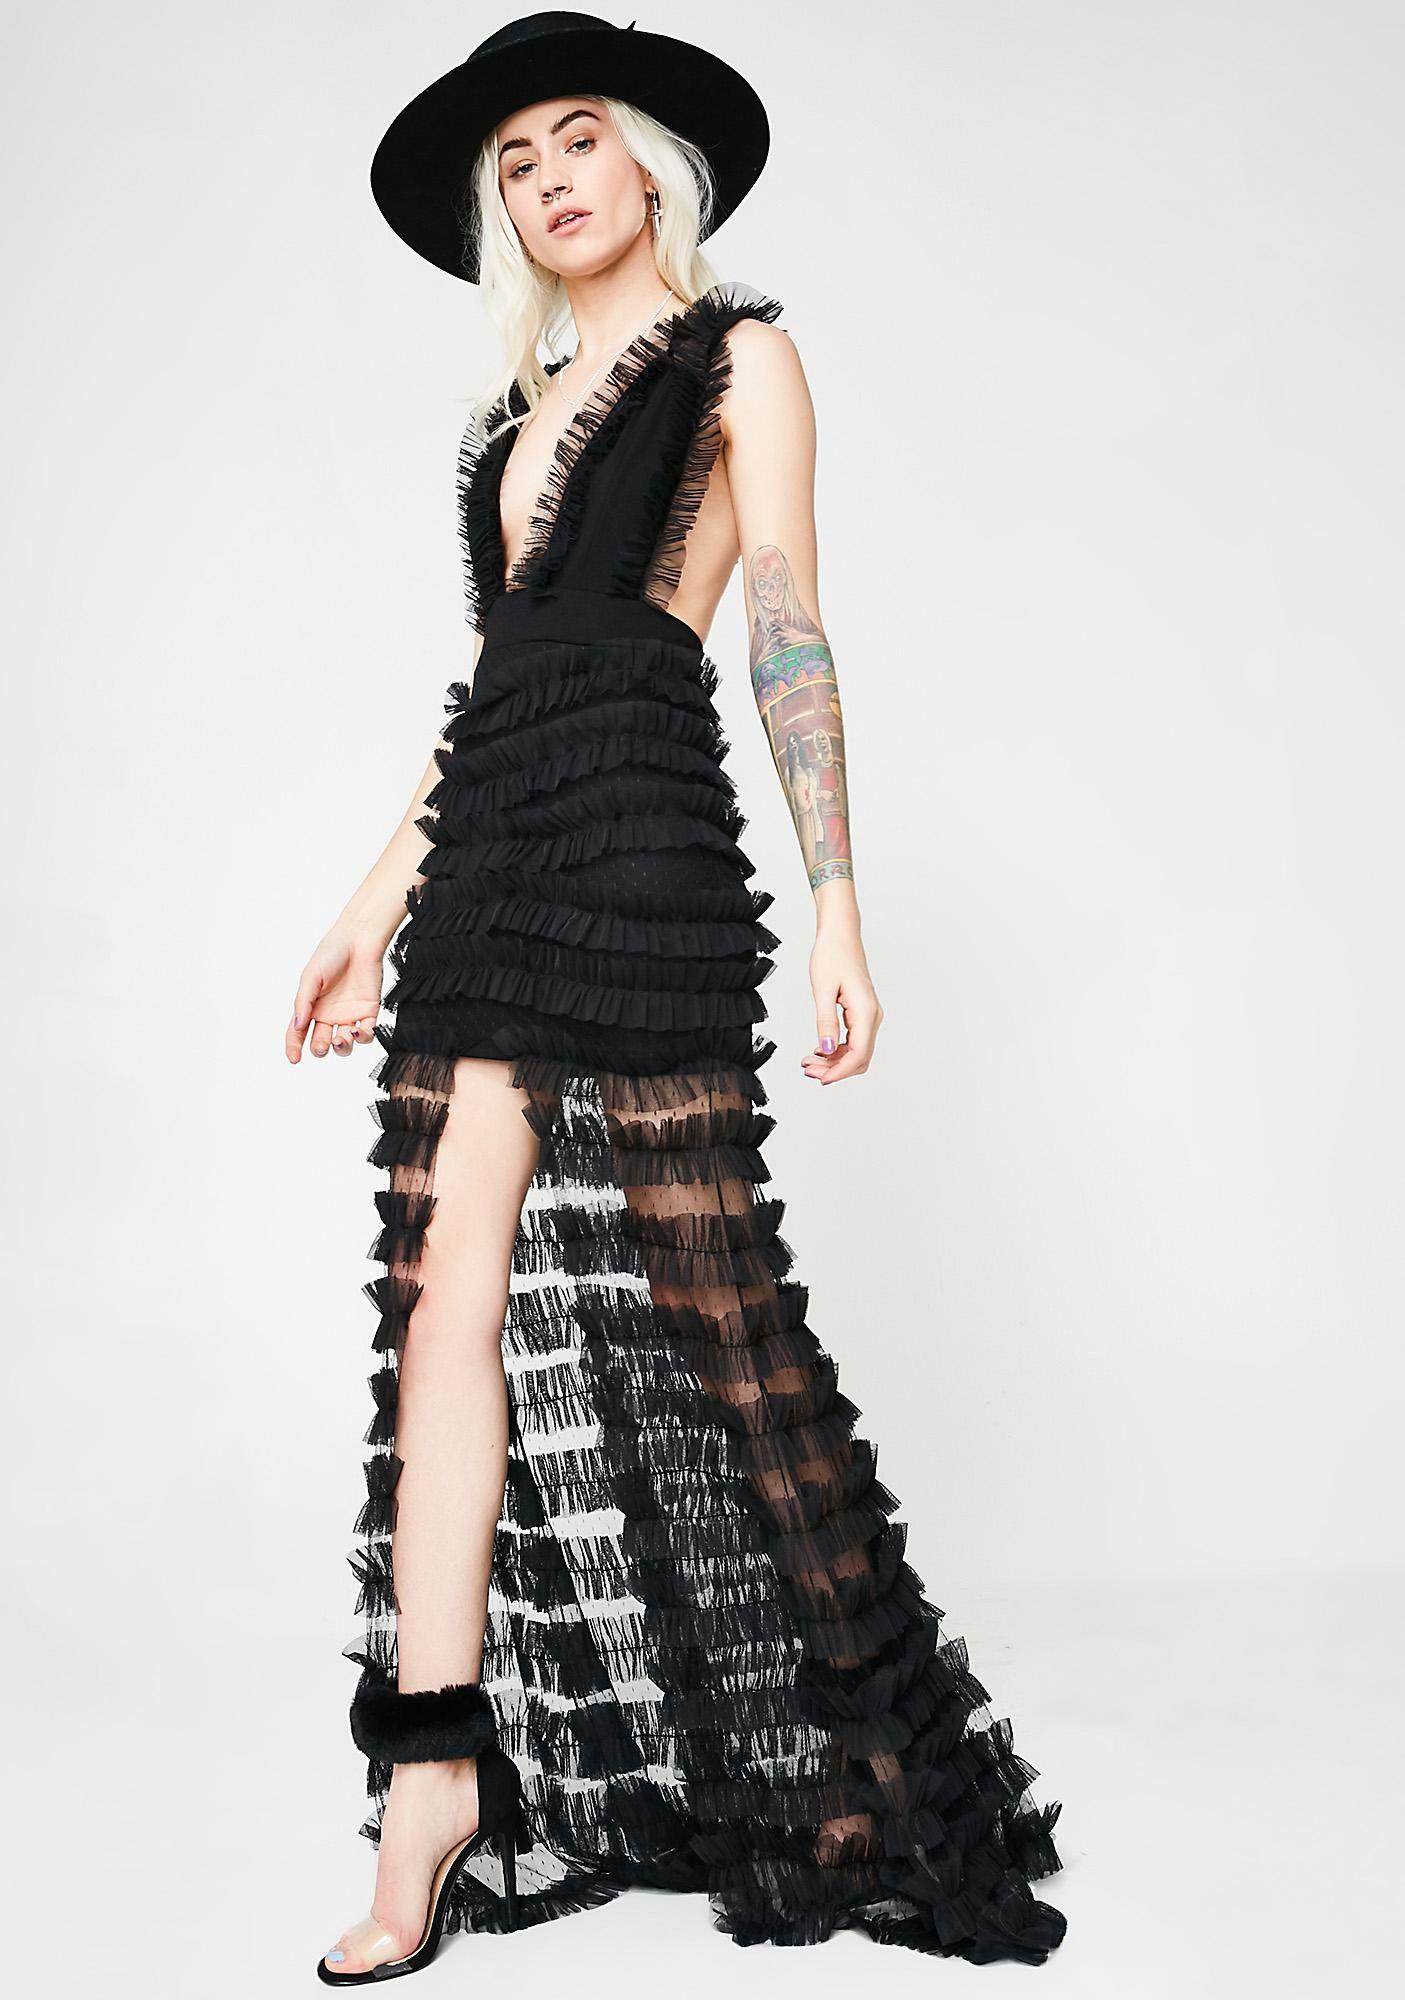 Kiki riki youure the one ruffled maxi dress fashion pinterest